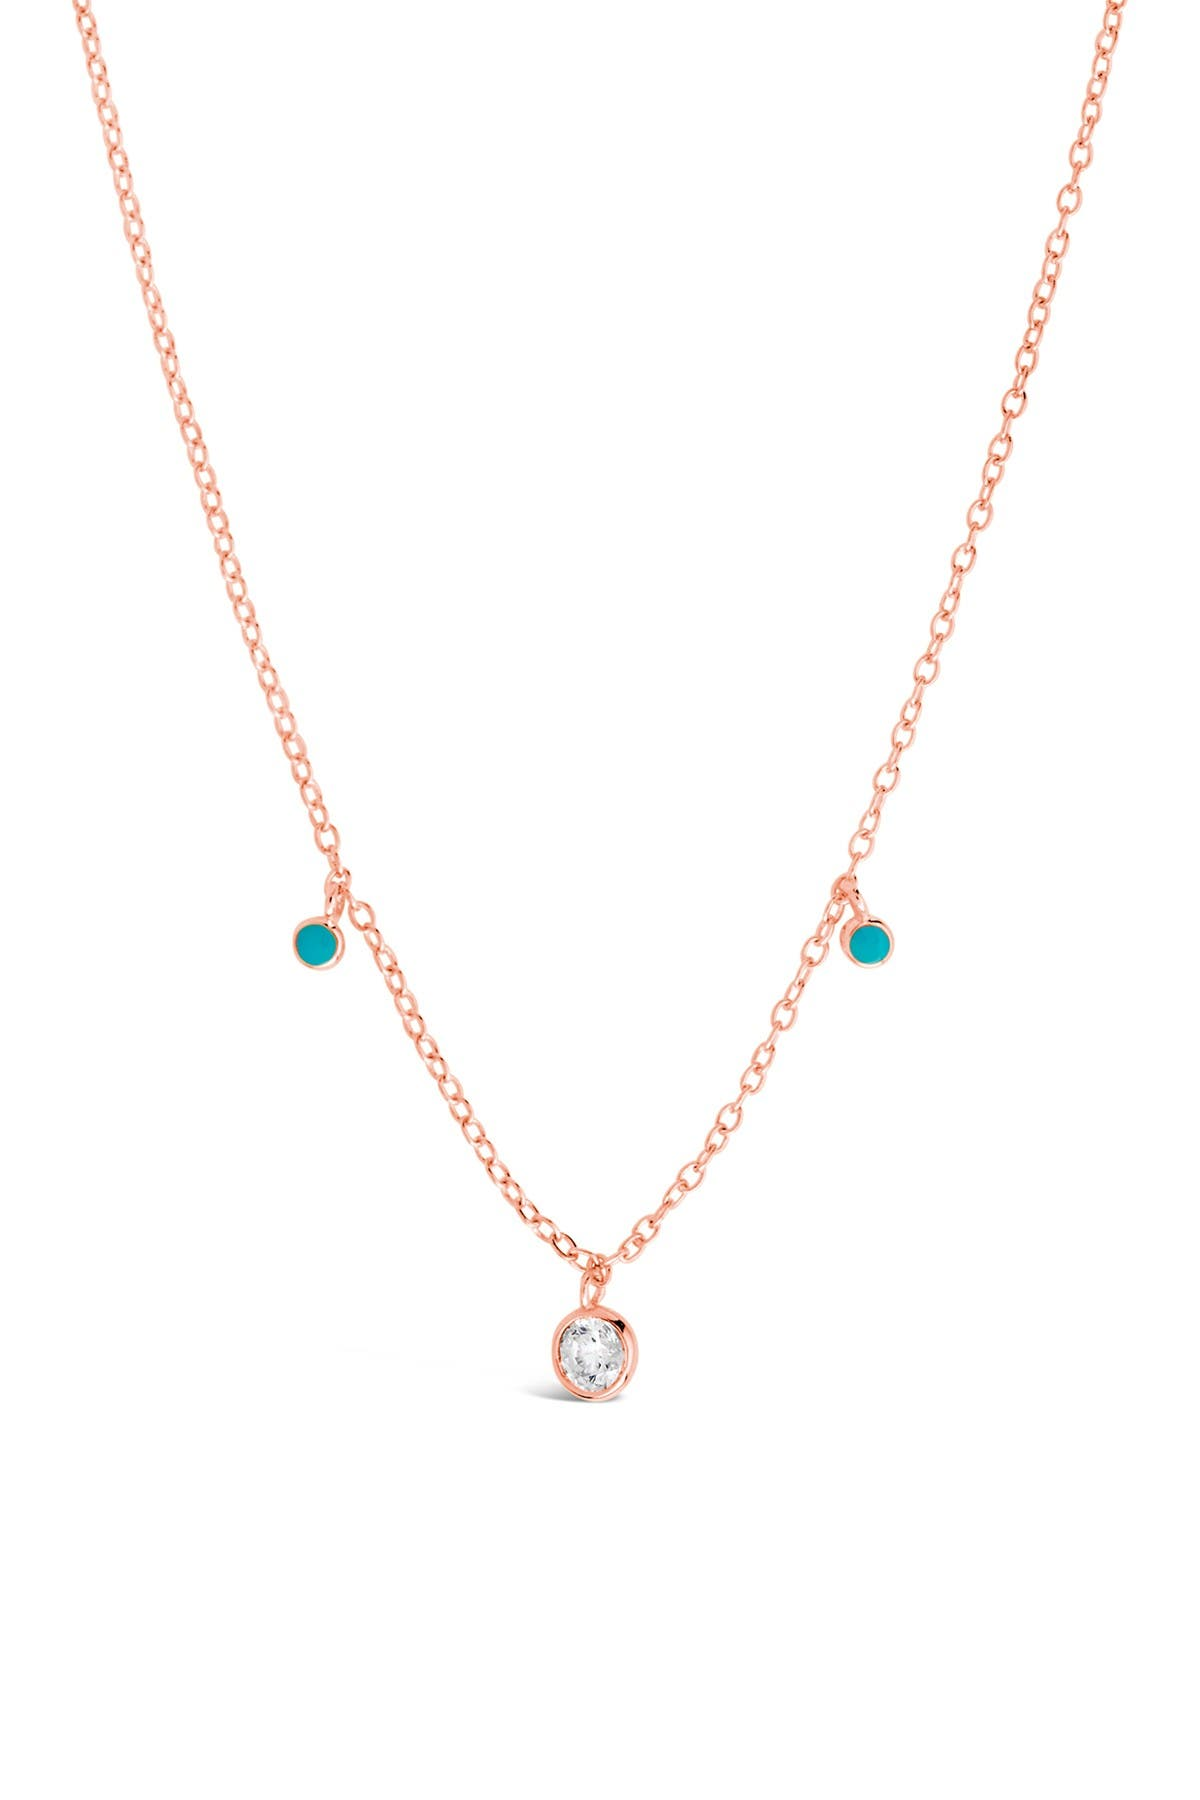 Image of Sterling Forever 14K Rose Gold Vermeil Plated Sterling Silver Green Enamel & CZ Charm Necklace